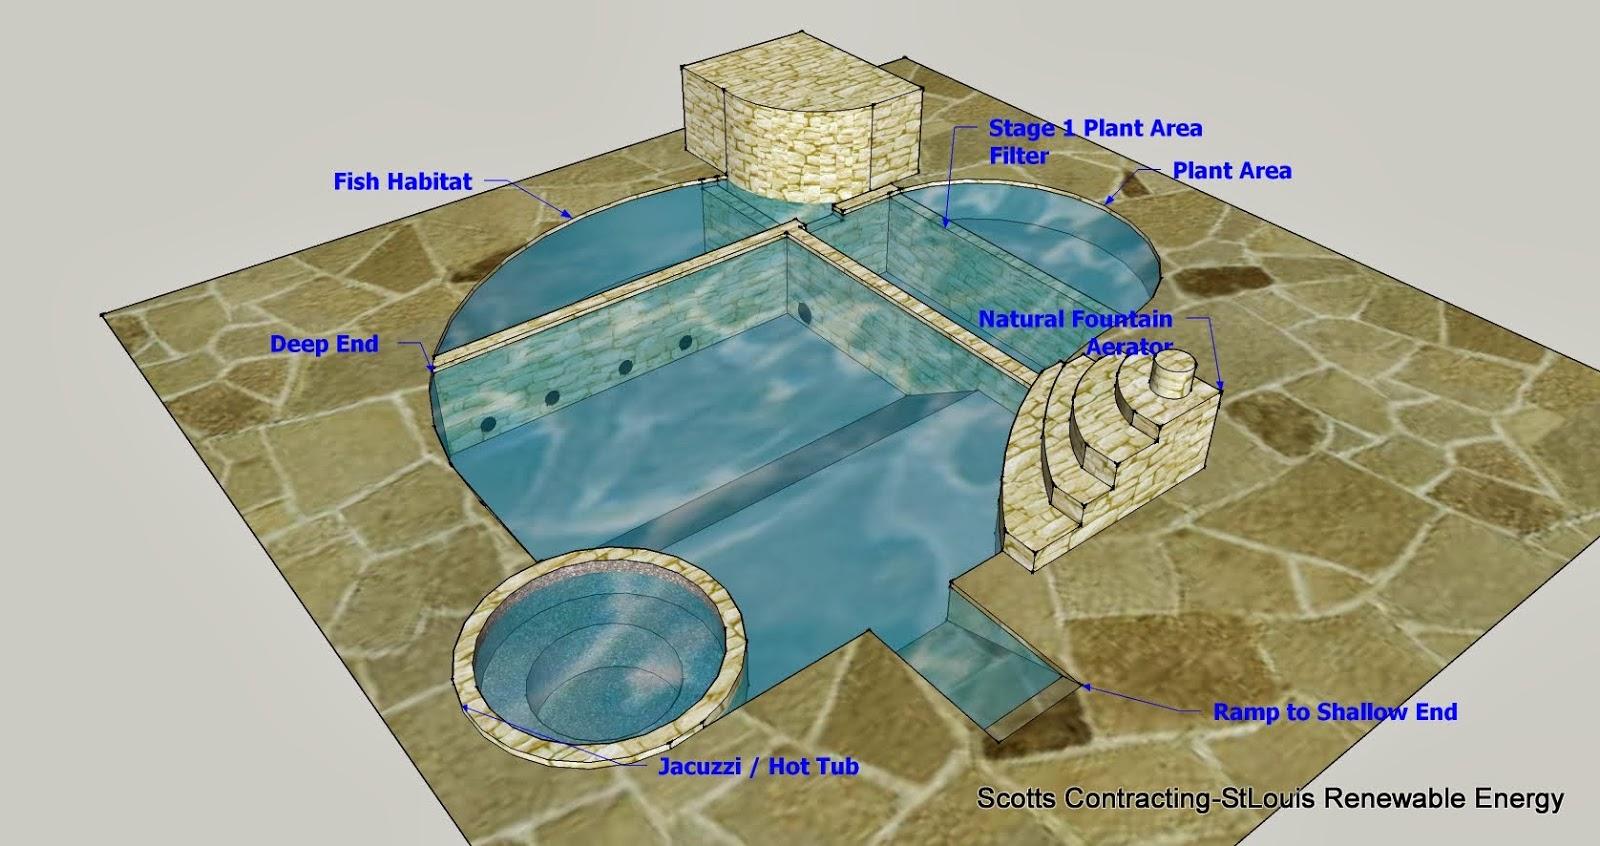 Natural Swimming Pool Design with Fish Habitat and Jacuzzi, Handicap Access Ramp, Fountain, Aquatic Plant Habitat, Pump House